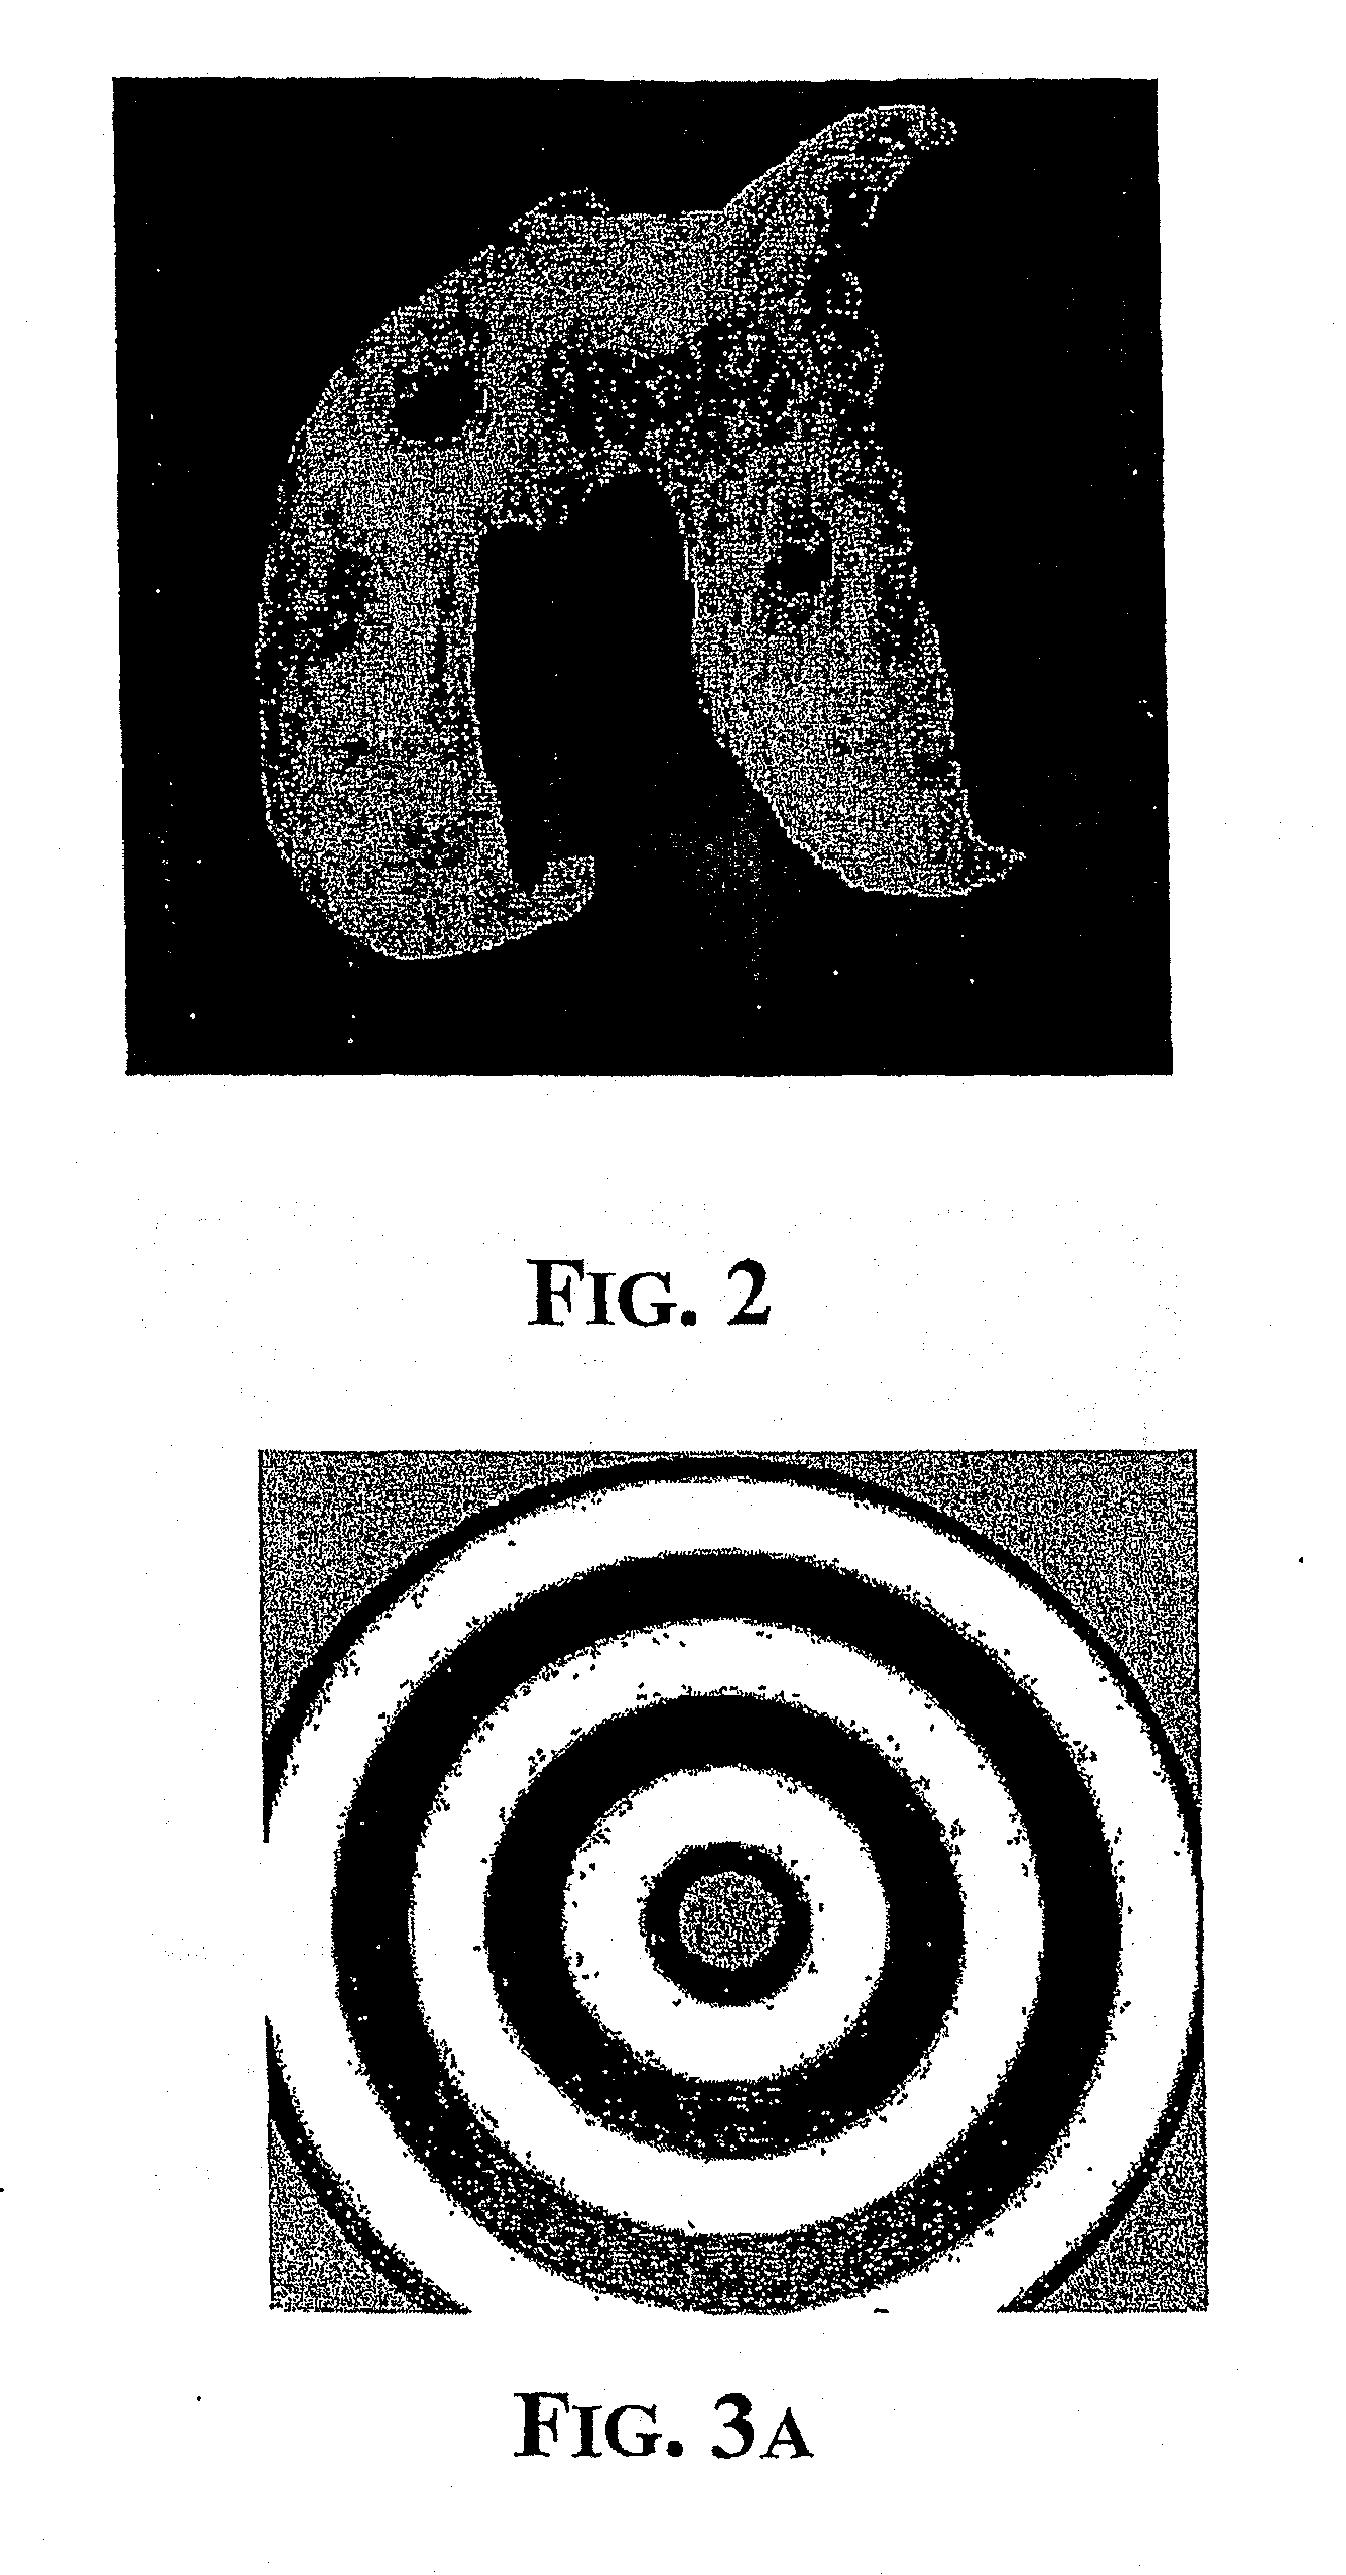 logo logo 标志 设计 矢量 矢量图 素材 图标 1346_2575 竖版 竖屏